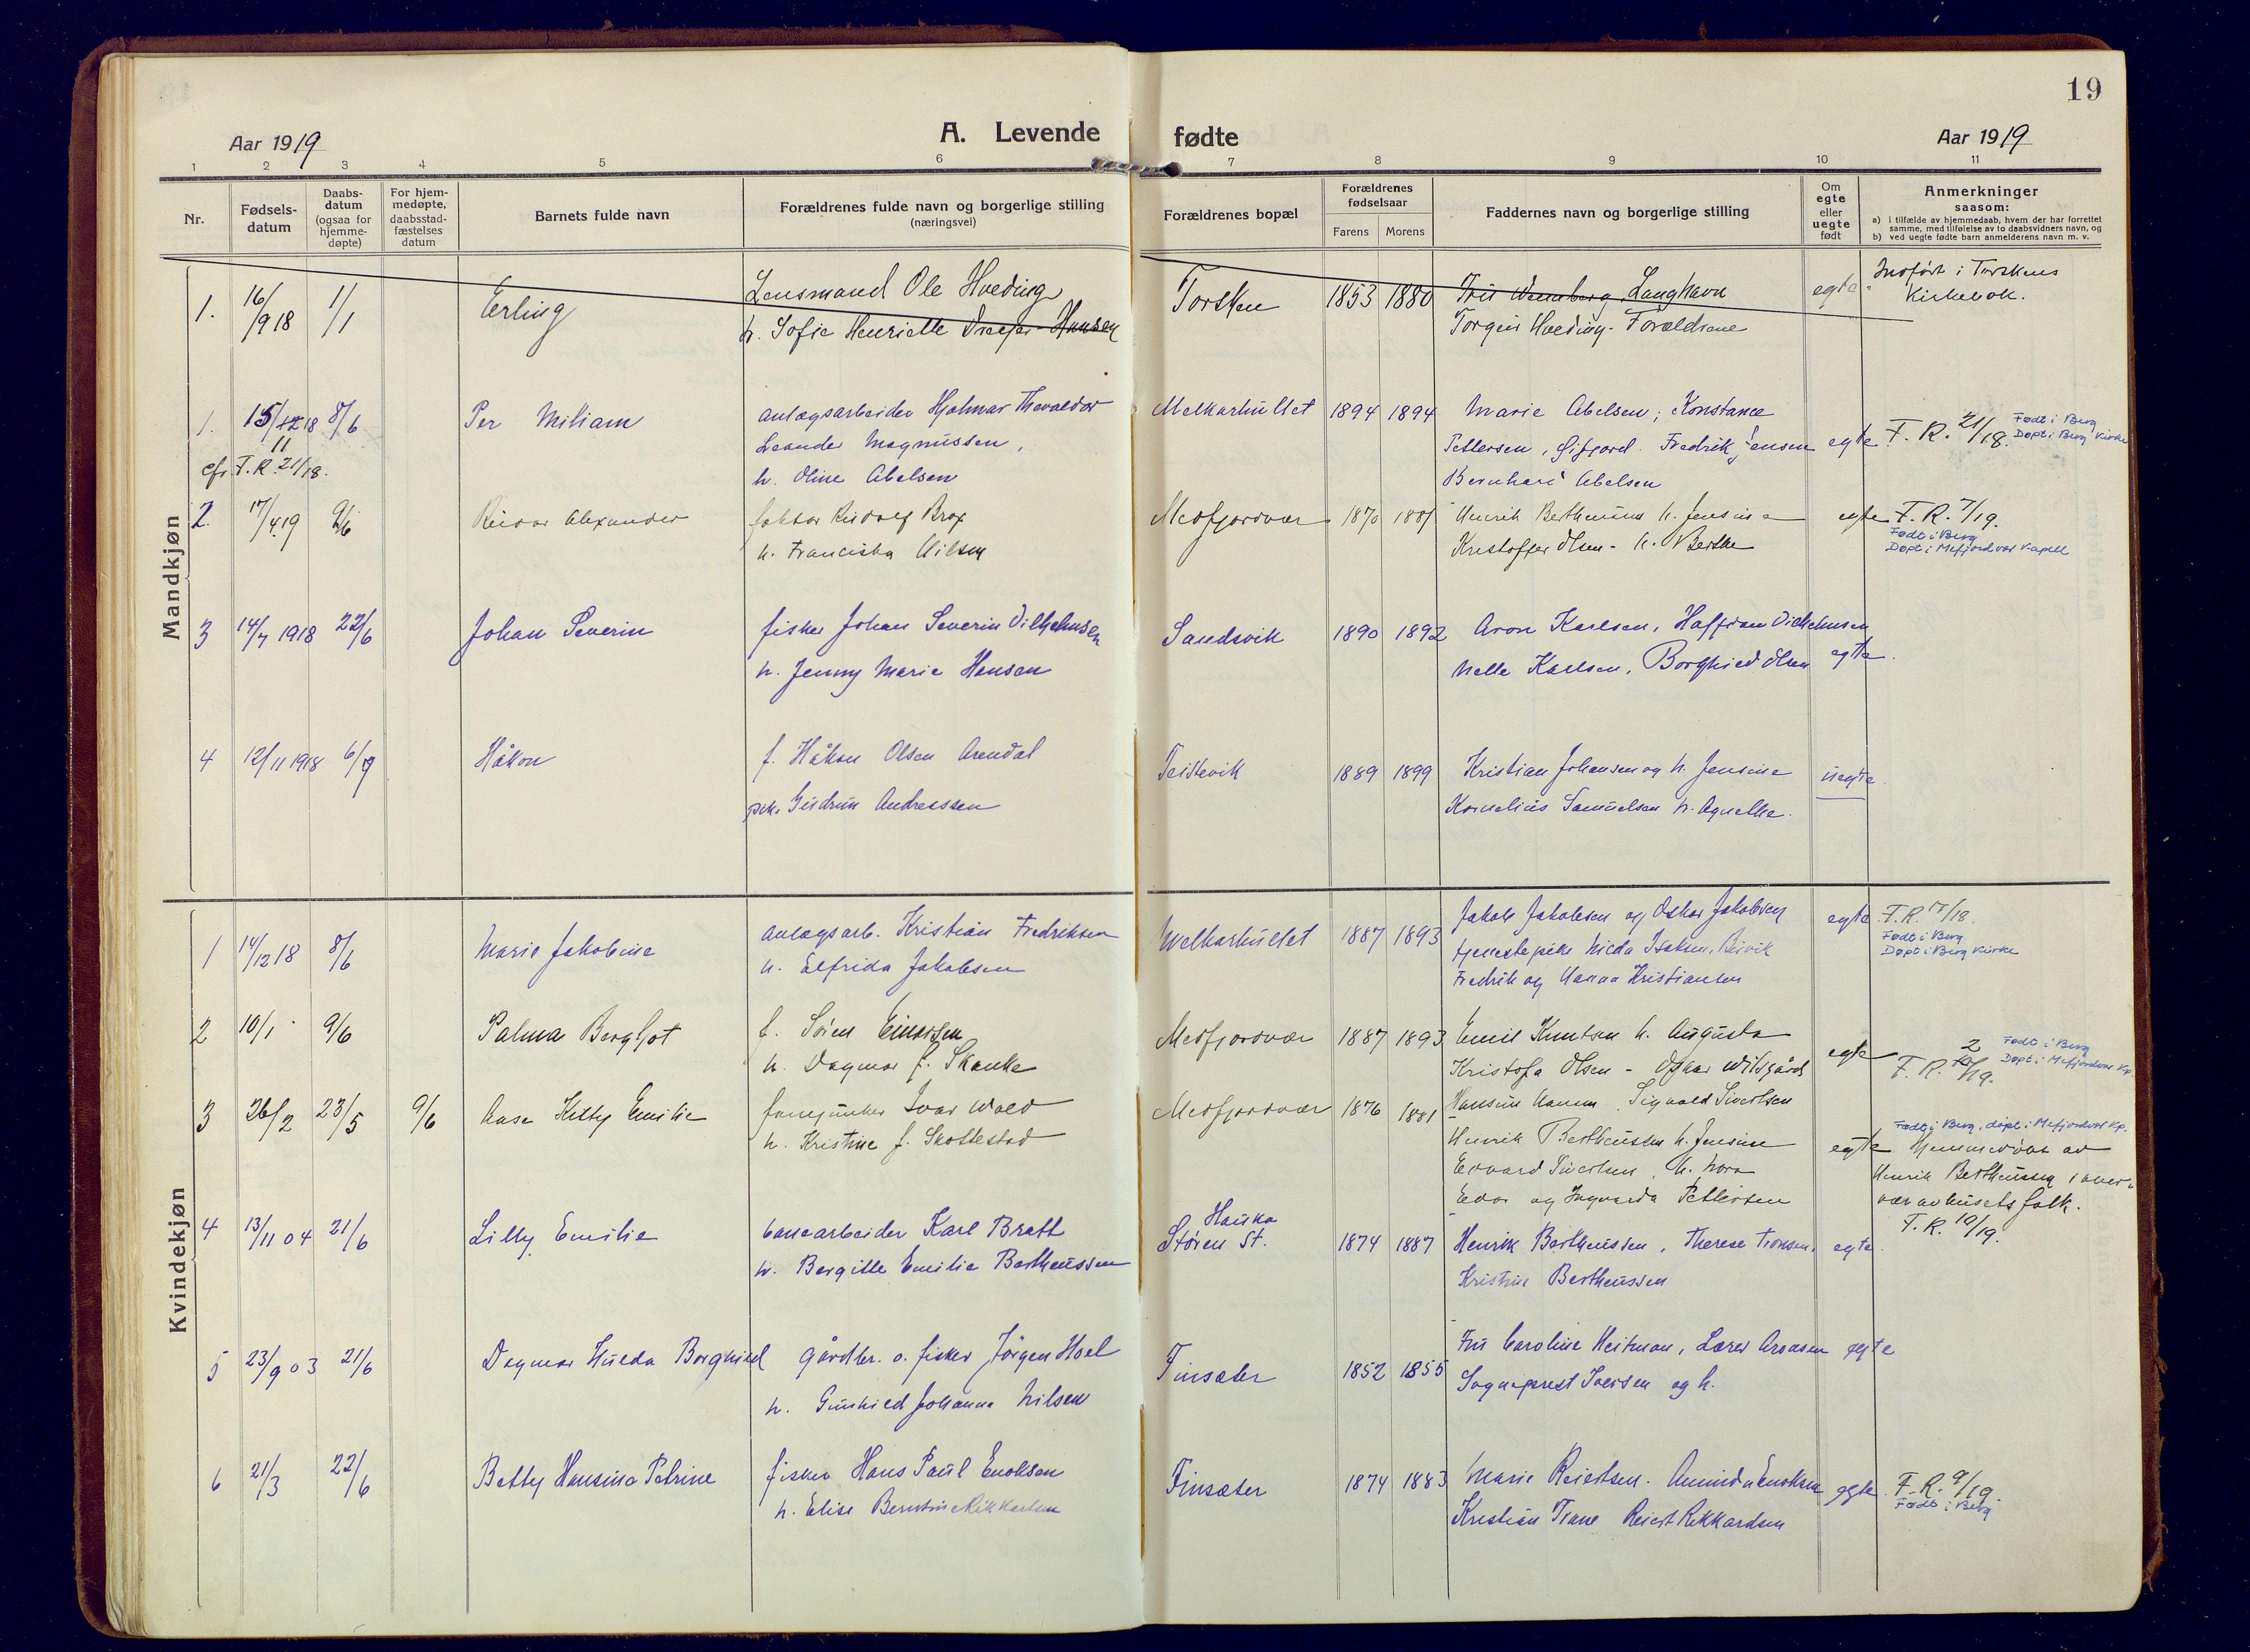 SATØ, Mefjord/Berg sokneprestkontor, G/Ga/Gaa: Ministerialbok nr. 9, 1916-1928, s. 19